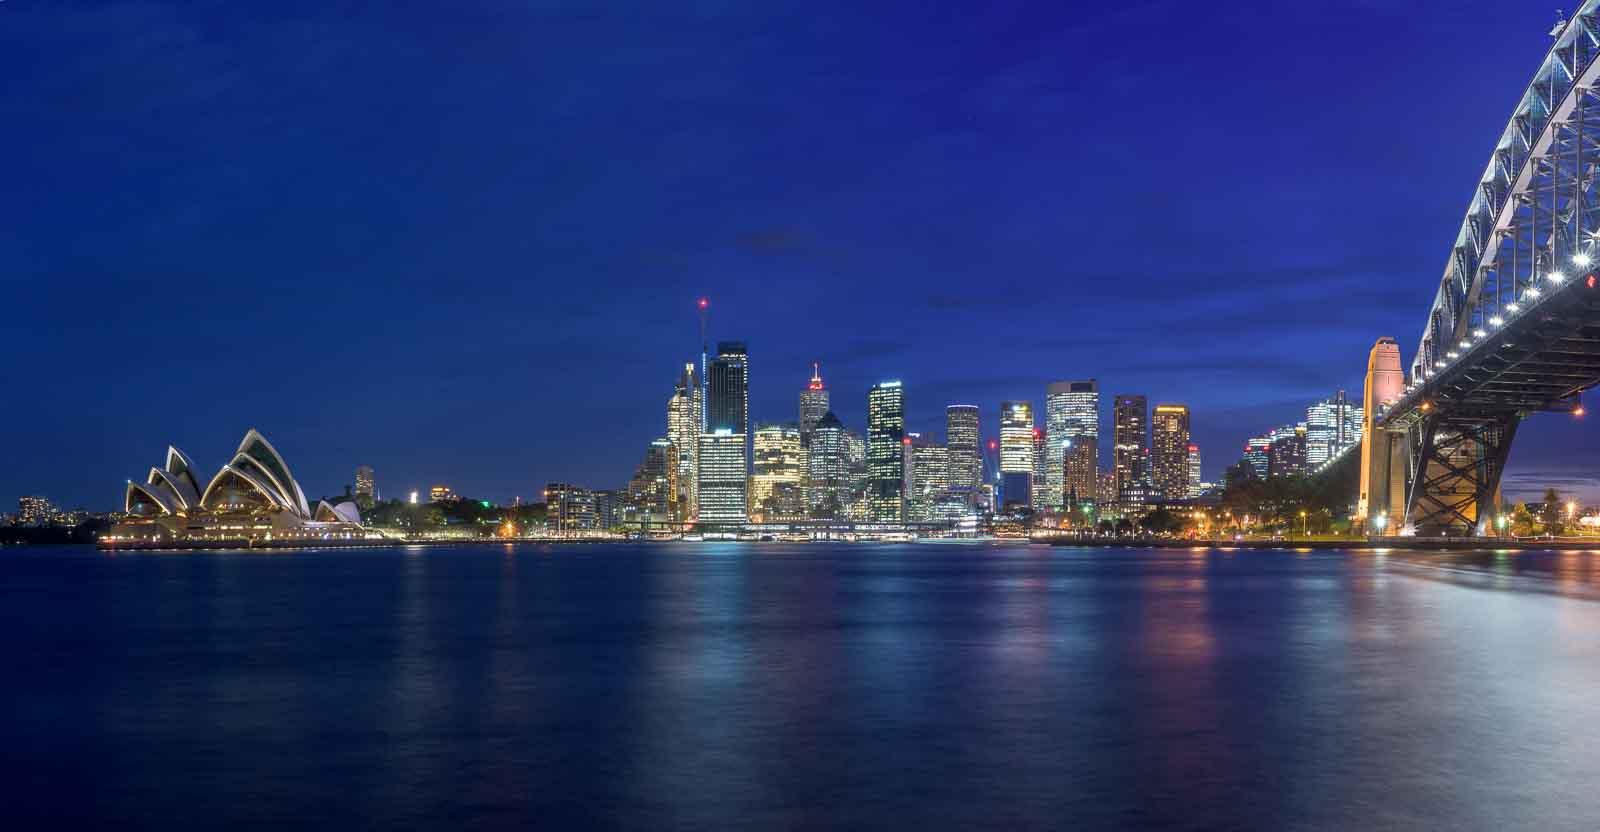 Sydney Skyline at Night by Kim Wilder Hinson